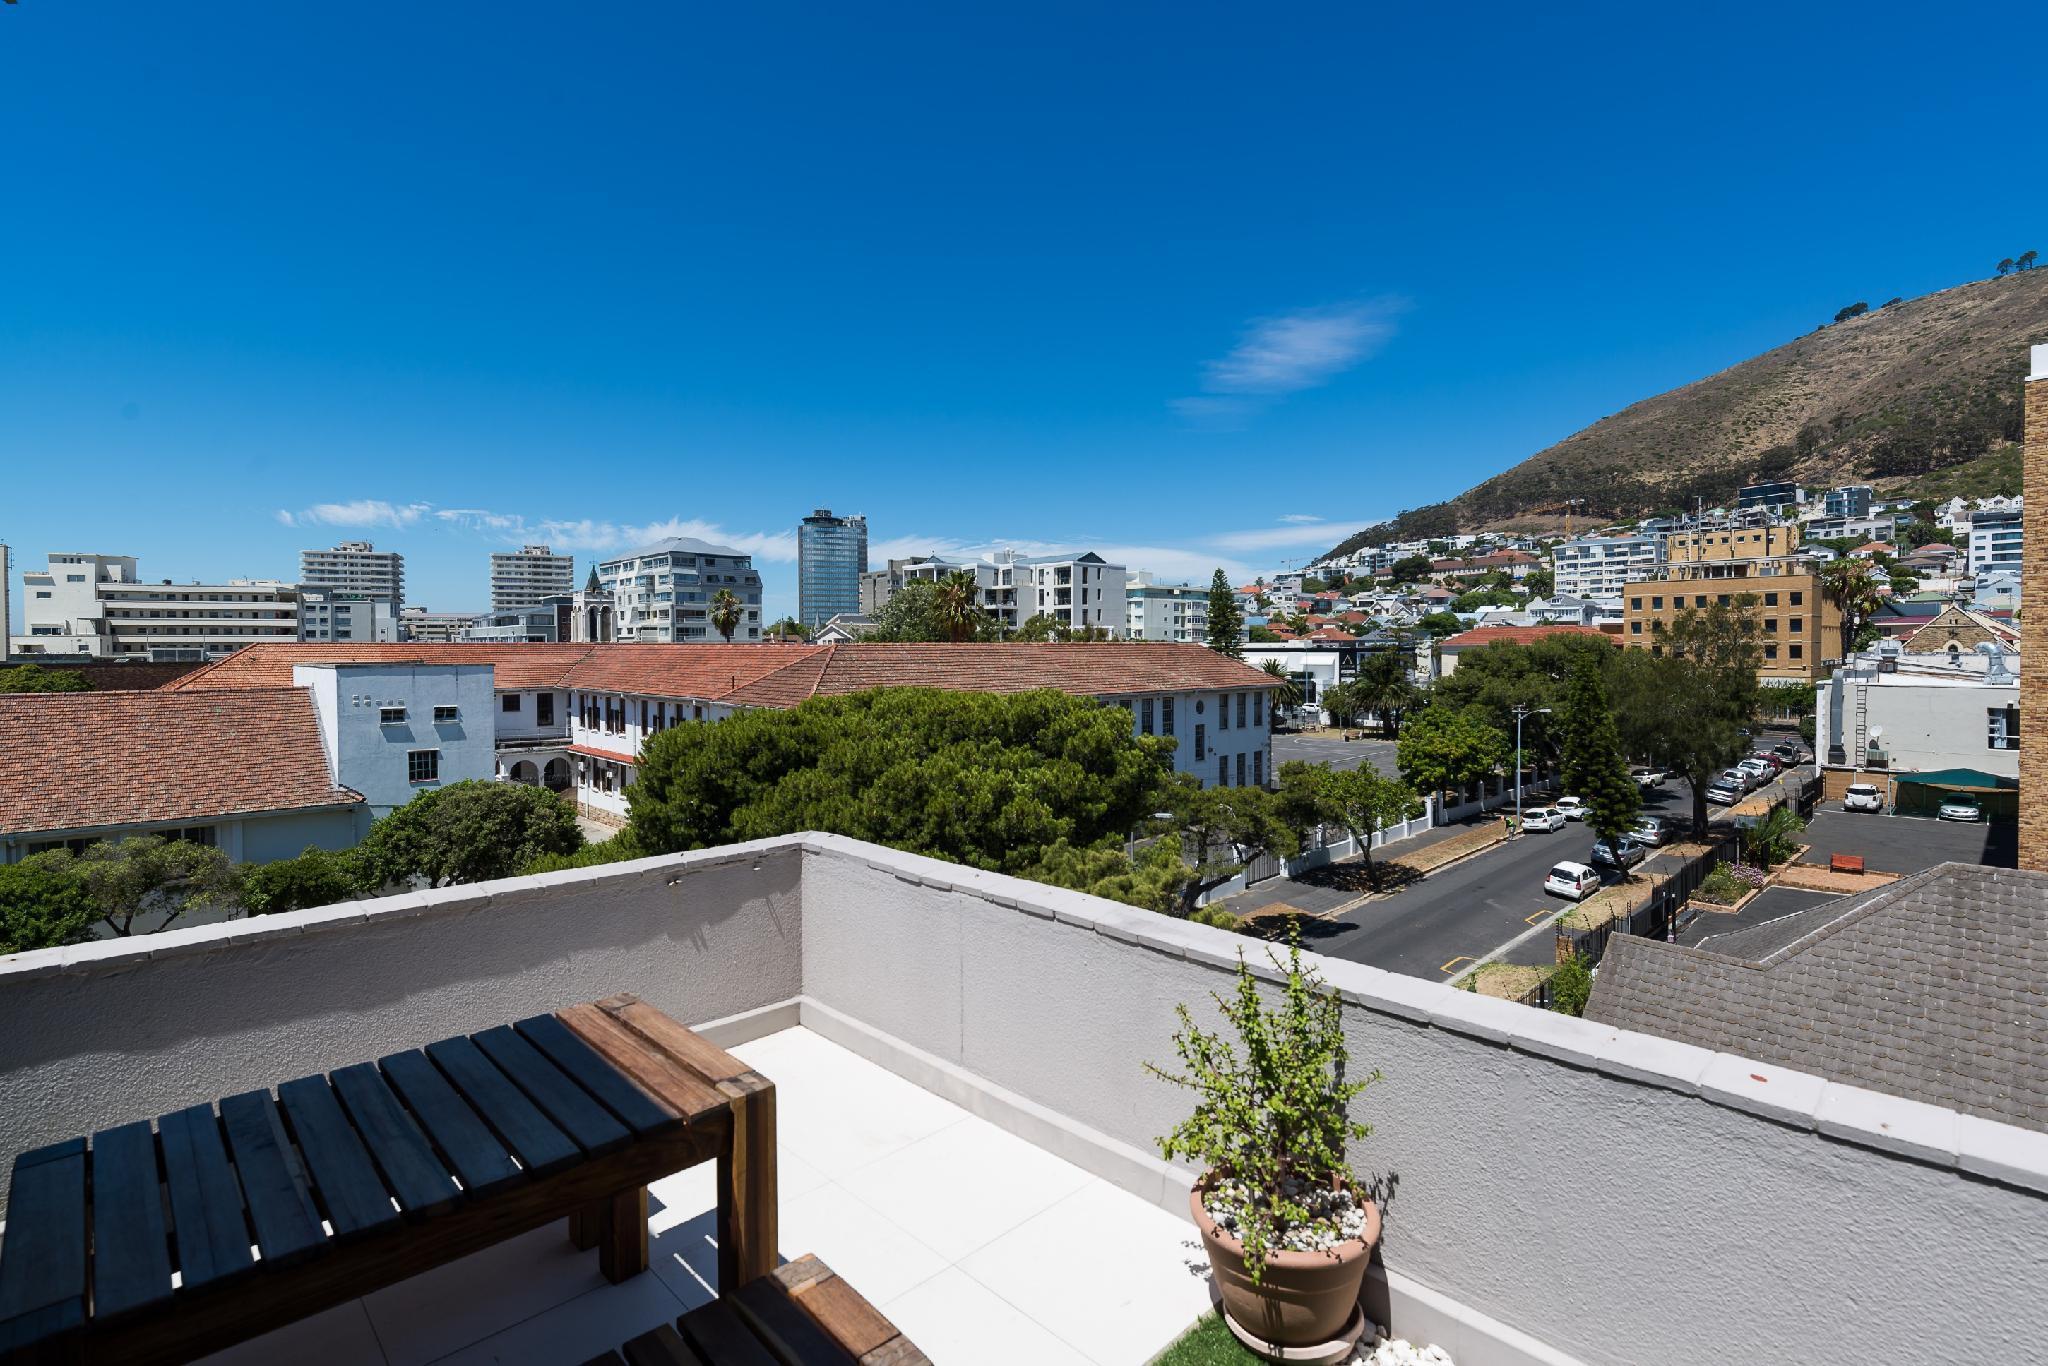 Penthouse With Sea Views And Wraparound Balcony